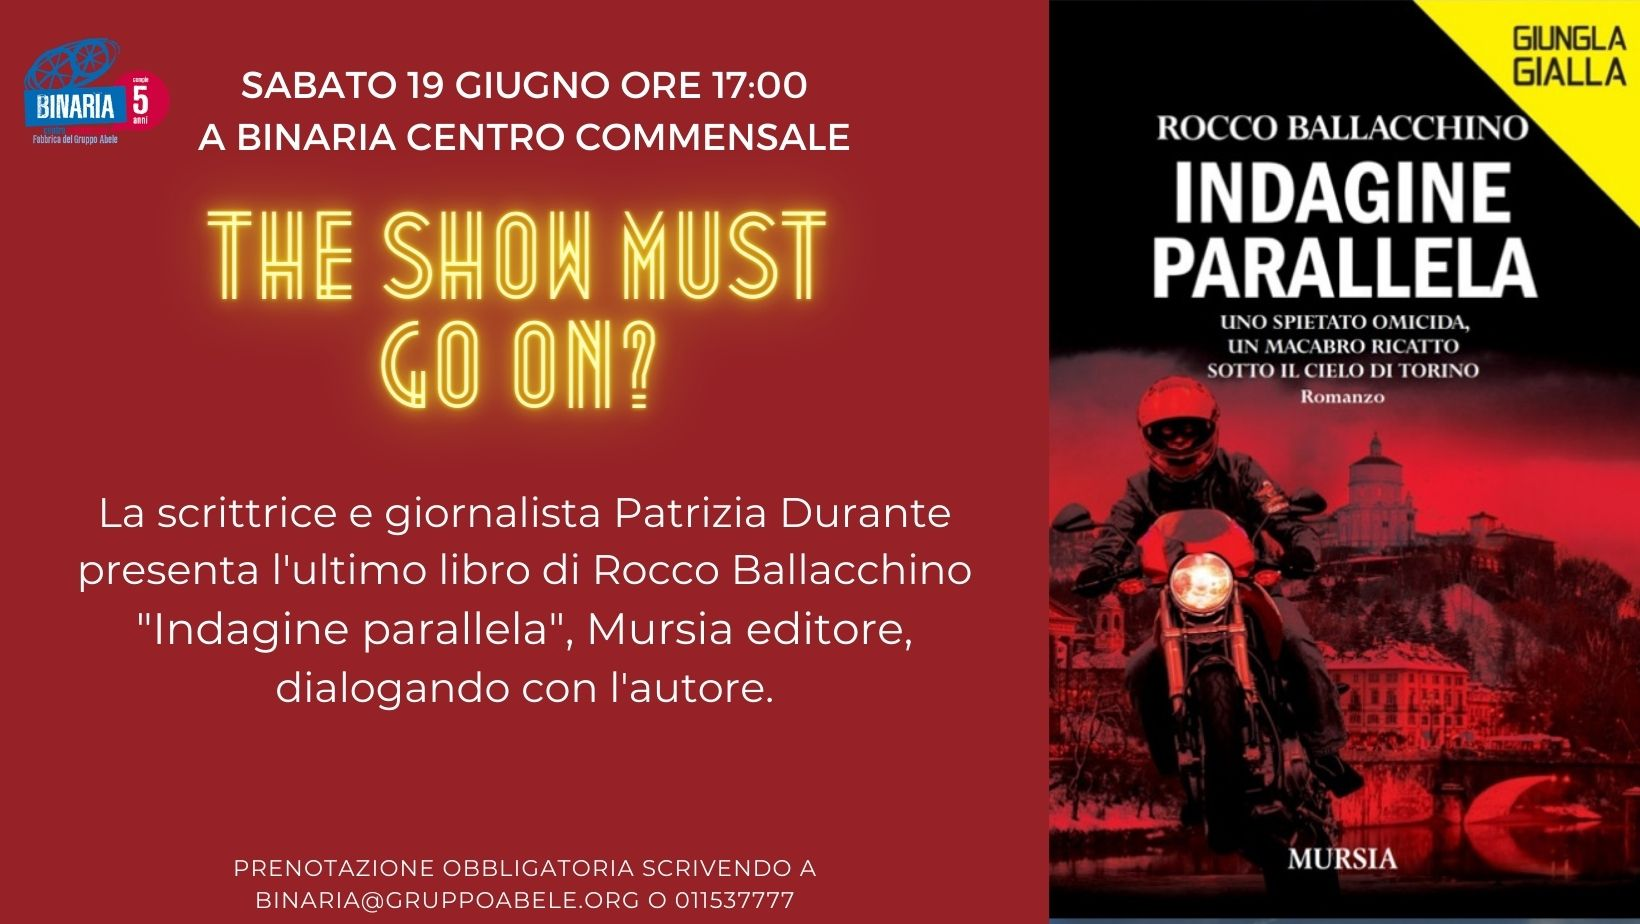 Indagine parallela di Rocco Ballachhino